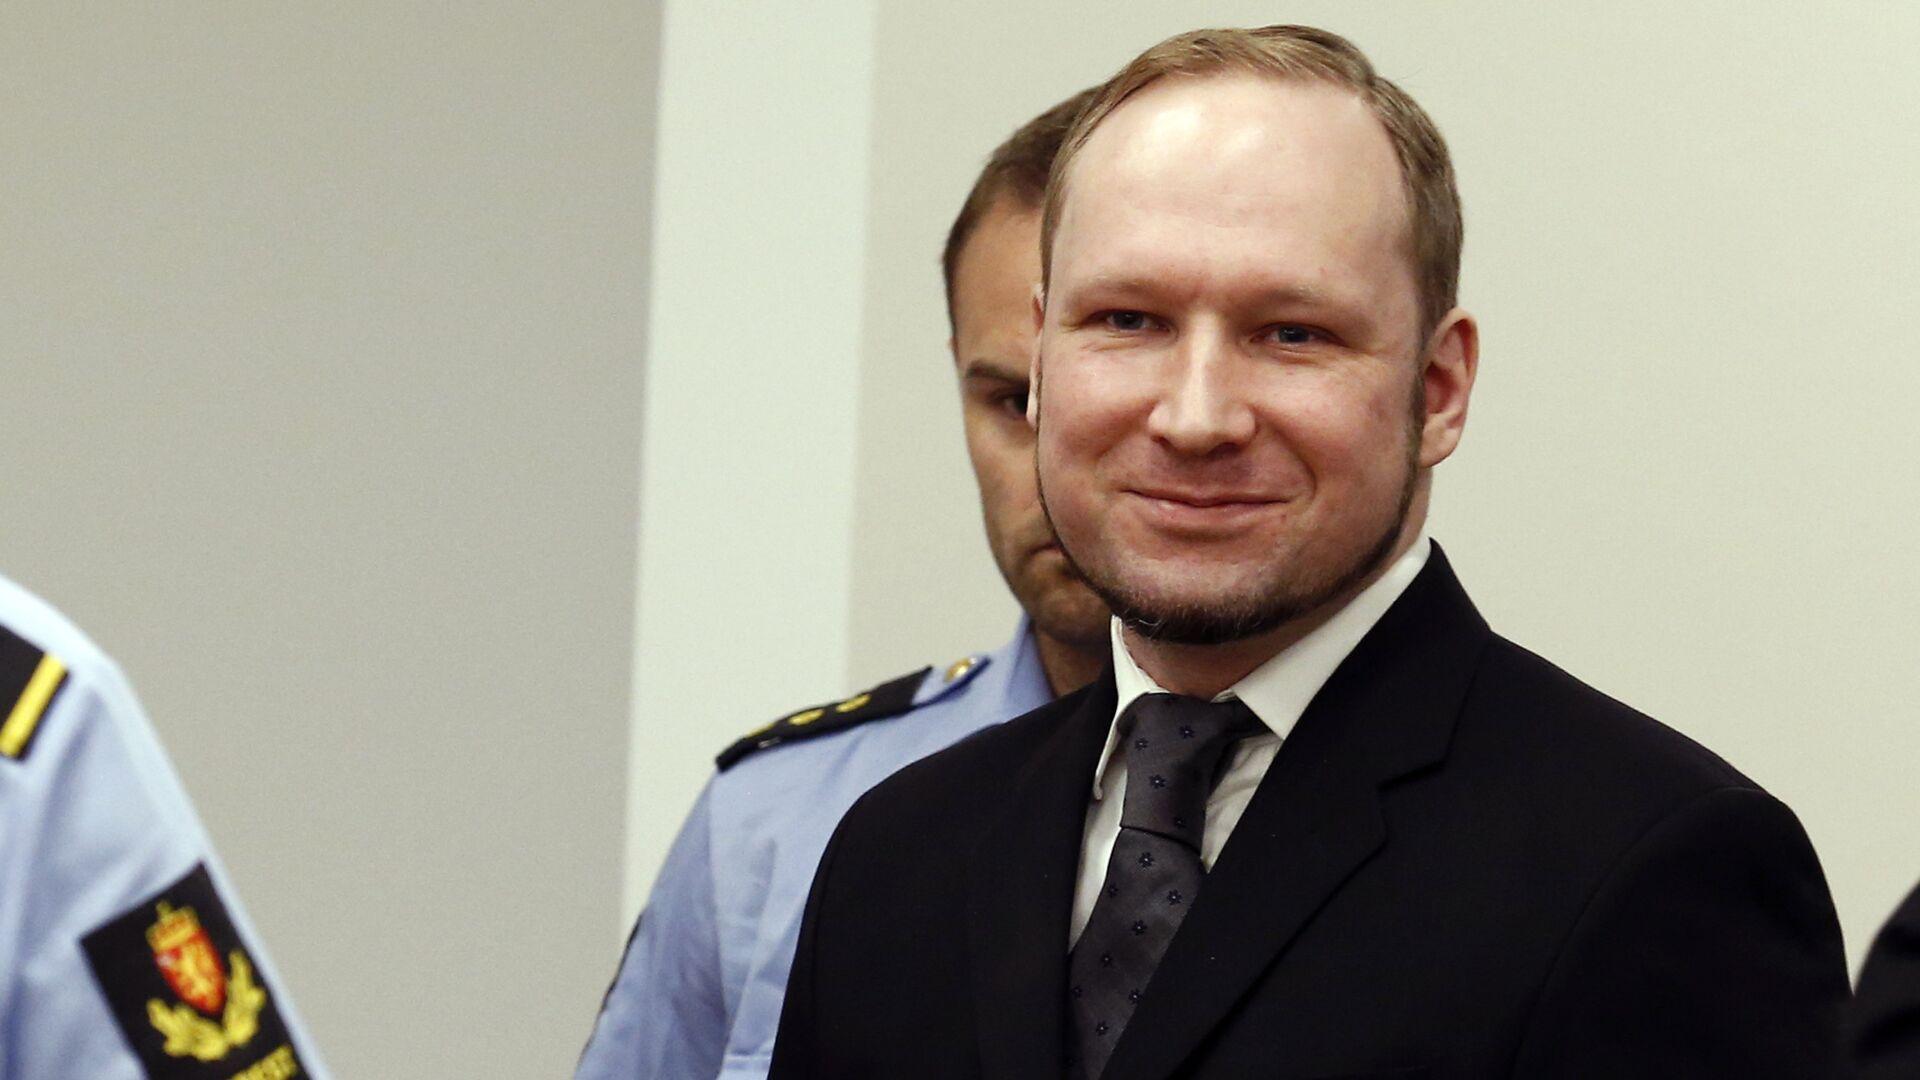 Anders Behring Breivik - strage di Utoya, 77 vittime - Sputnik Italia, 1920, 21.07.2021